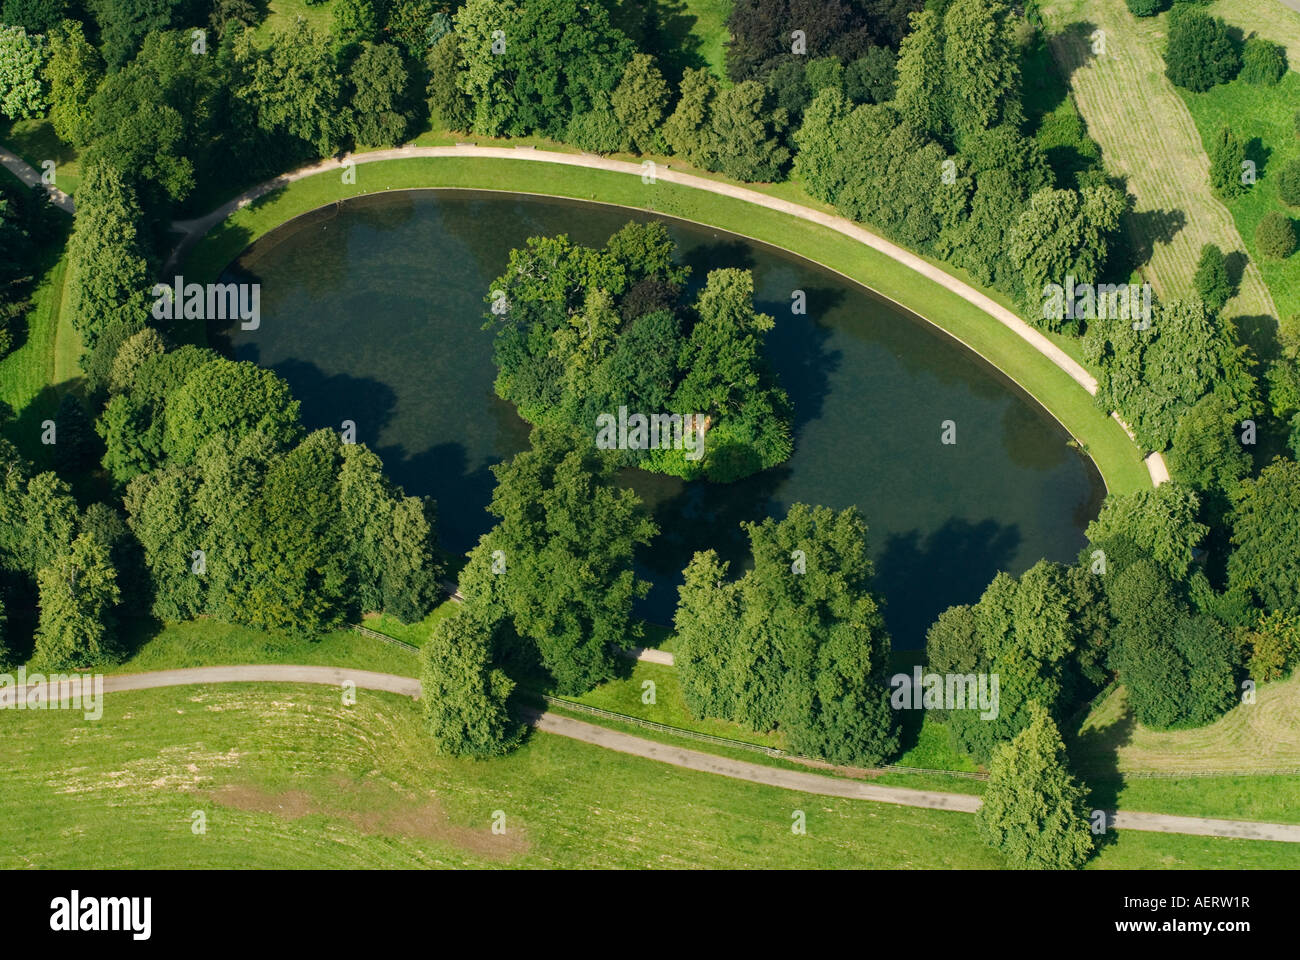 Princess Diana Gravesite Aerial View Of The Oval Lake And Island Where Princess